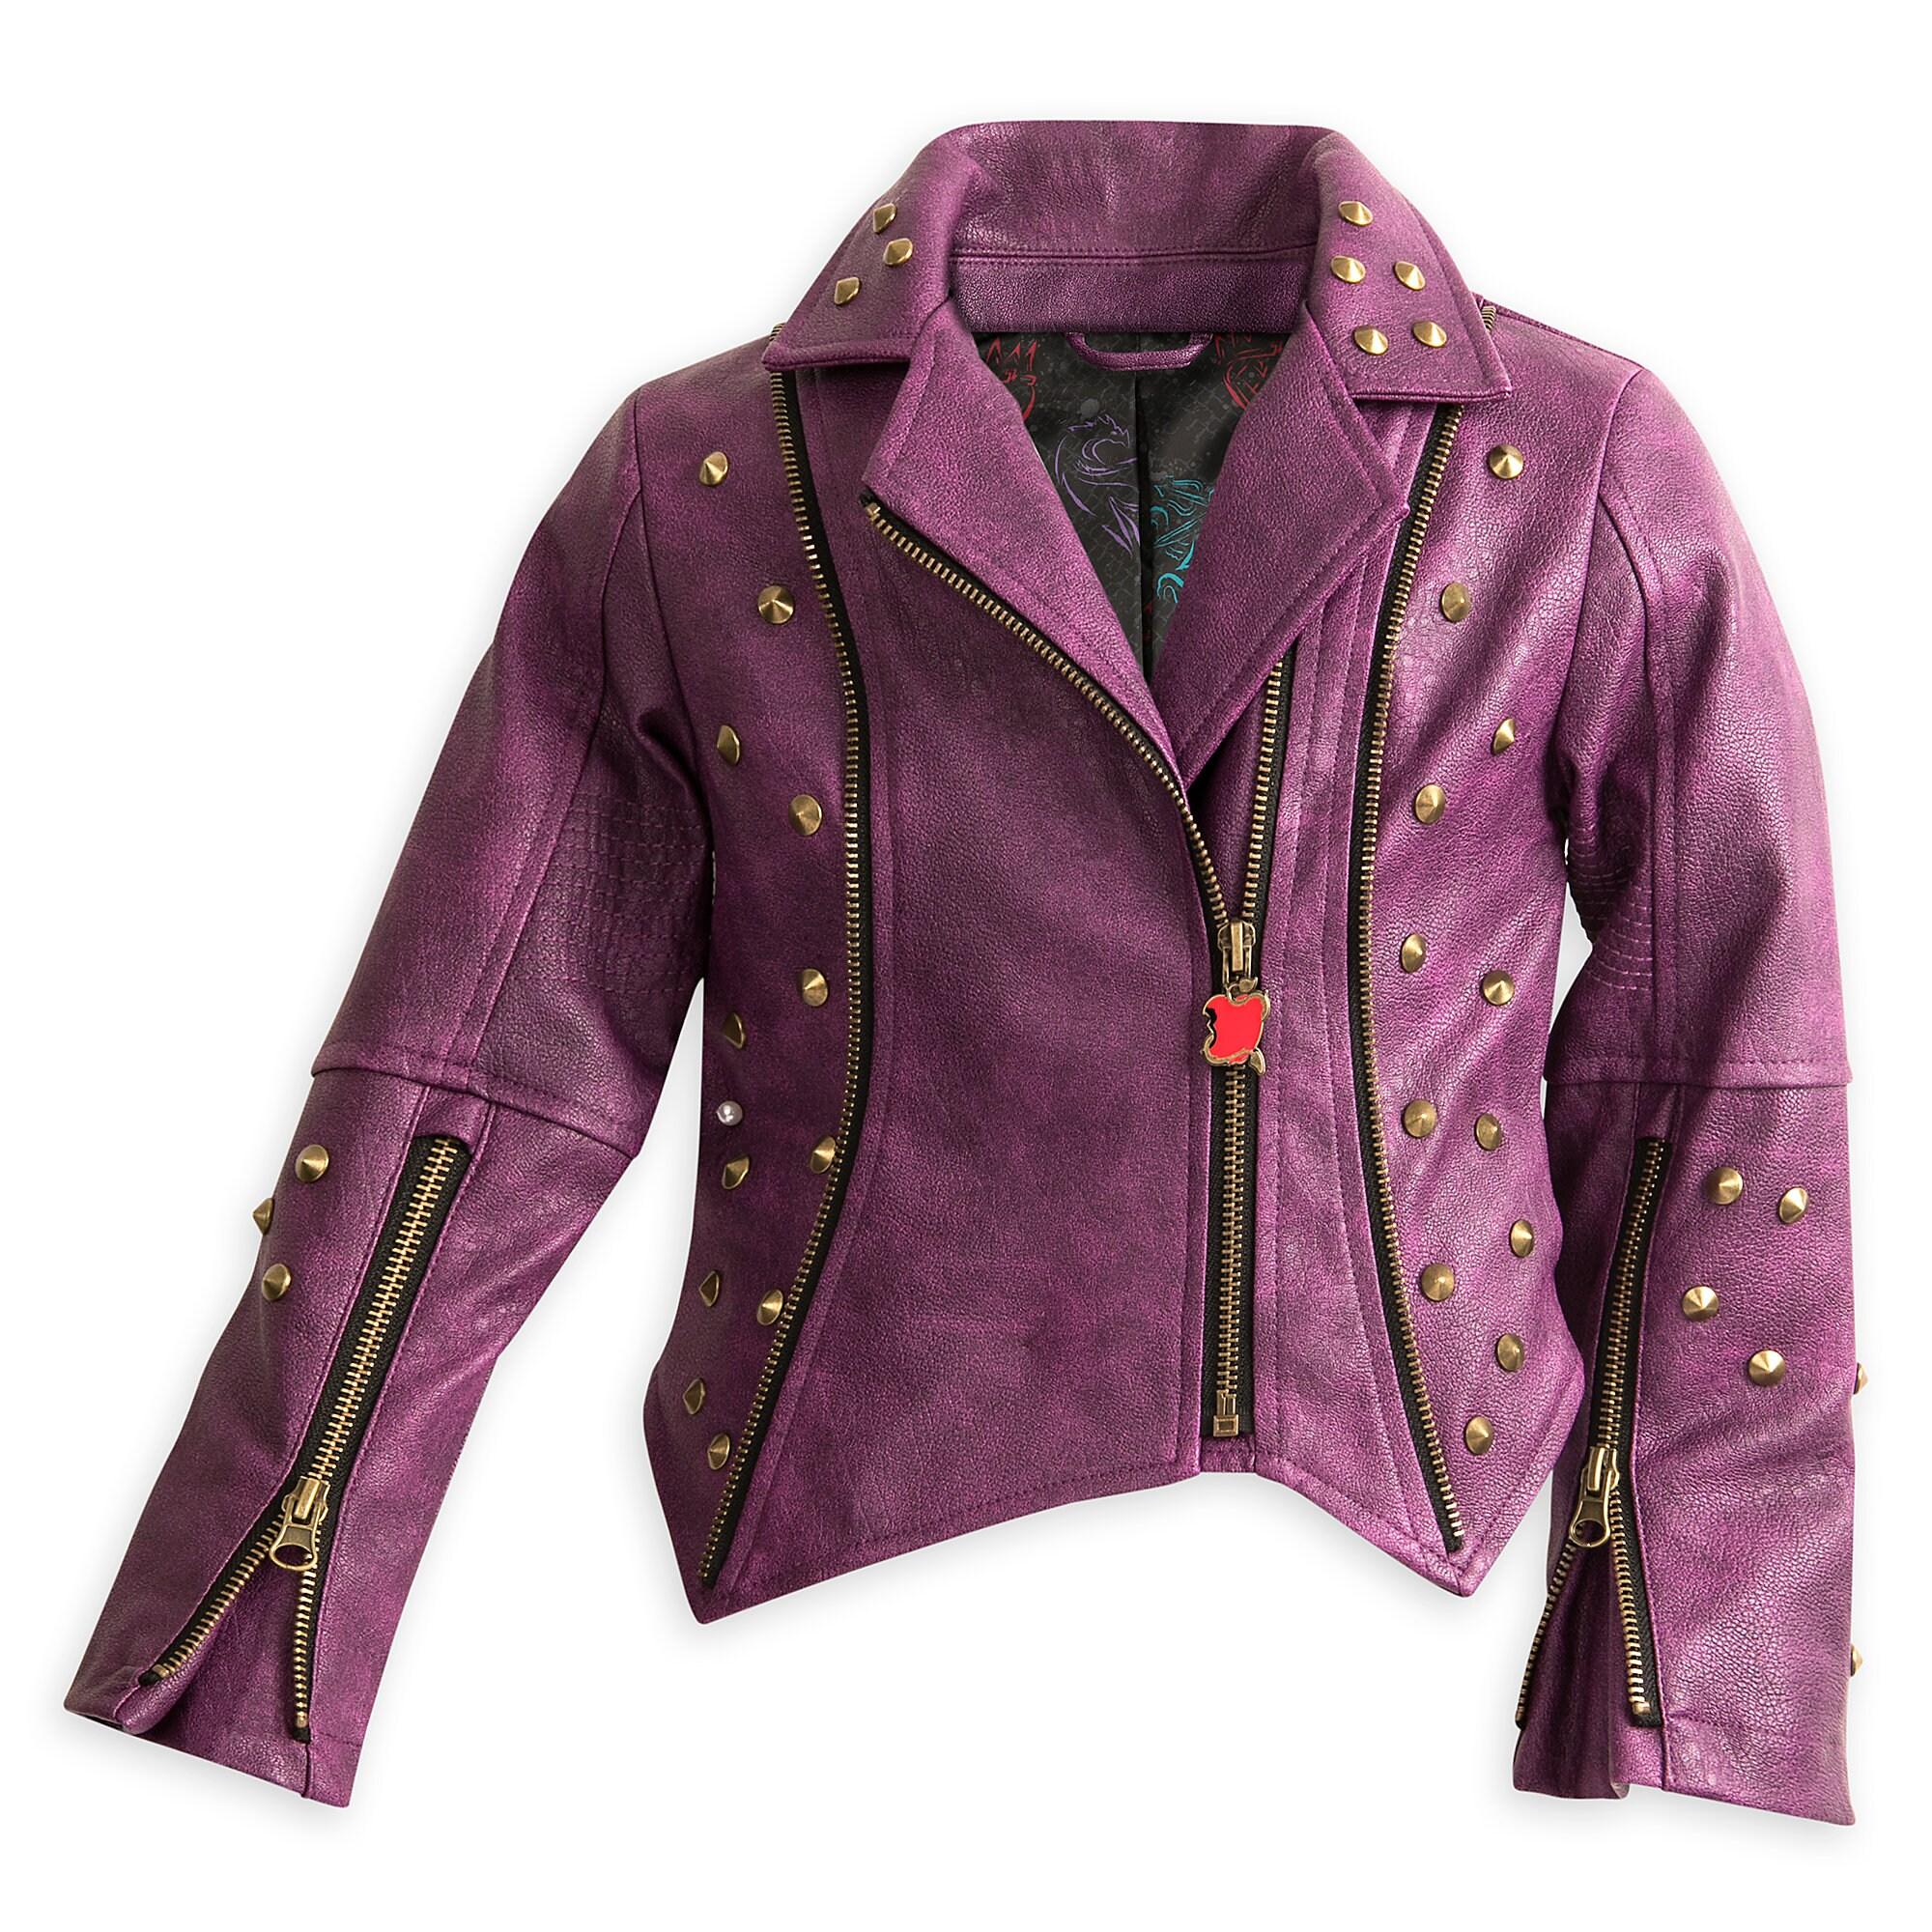 Descendants 2 Faux Leather Moto Jacket for Girls